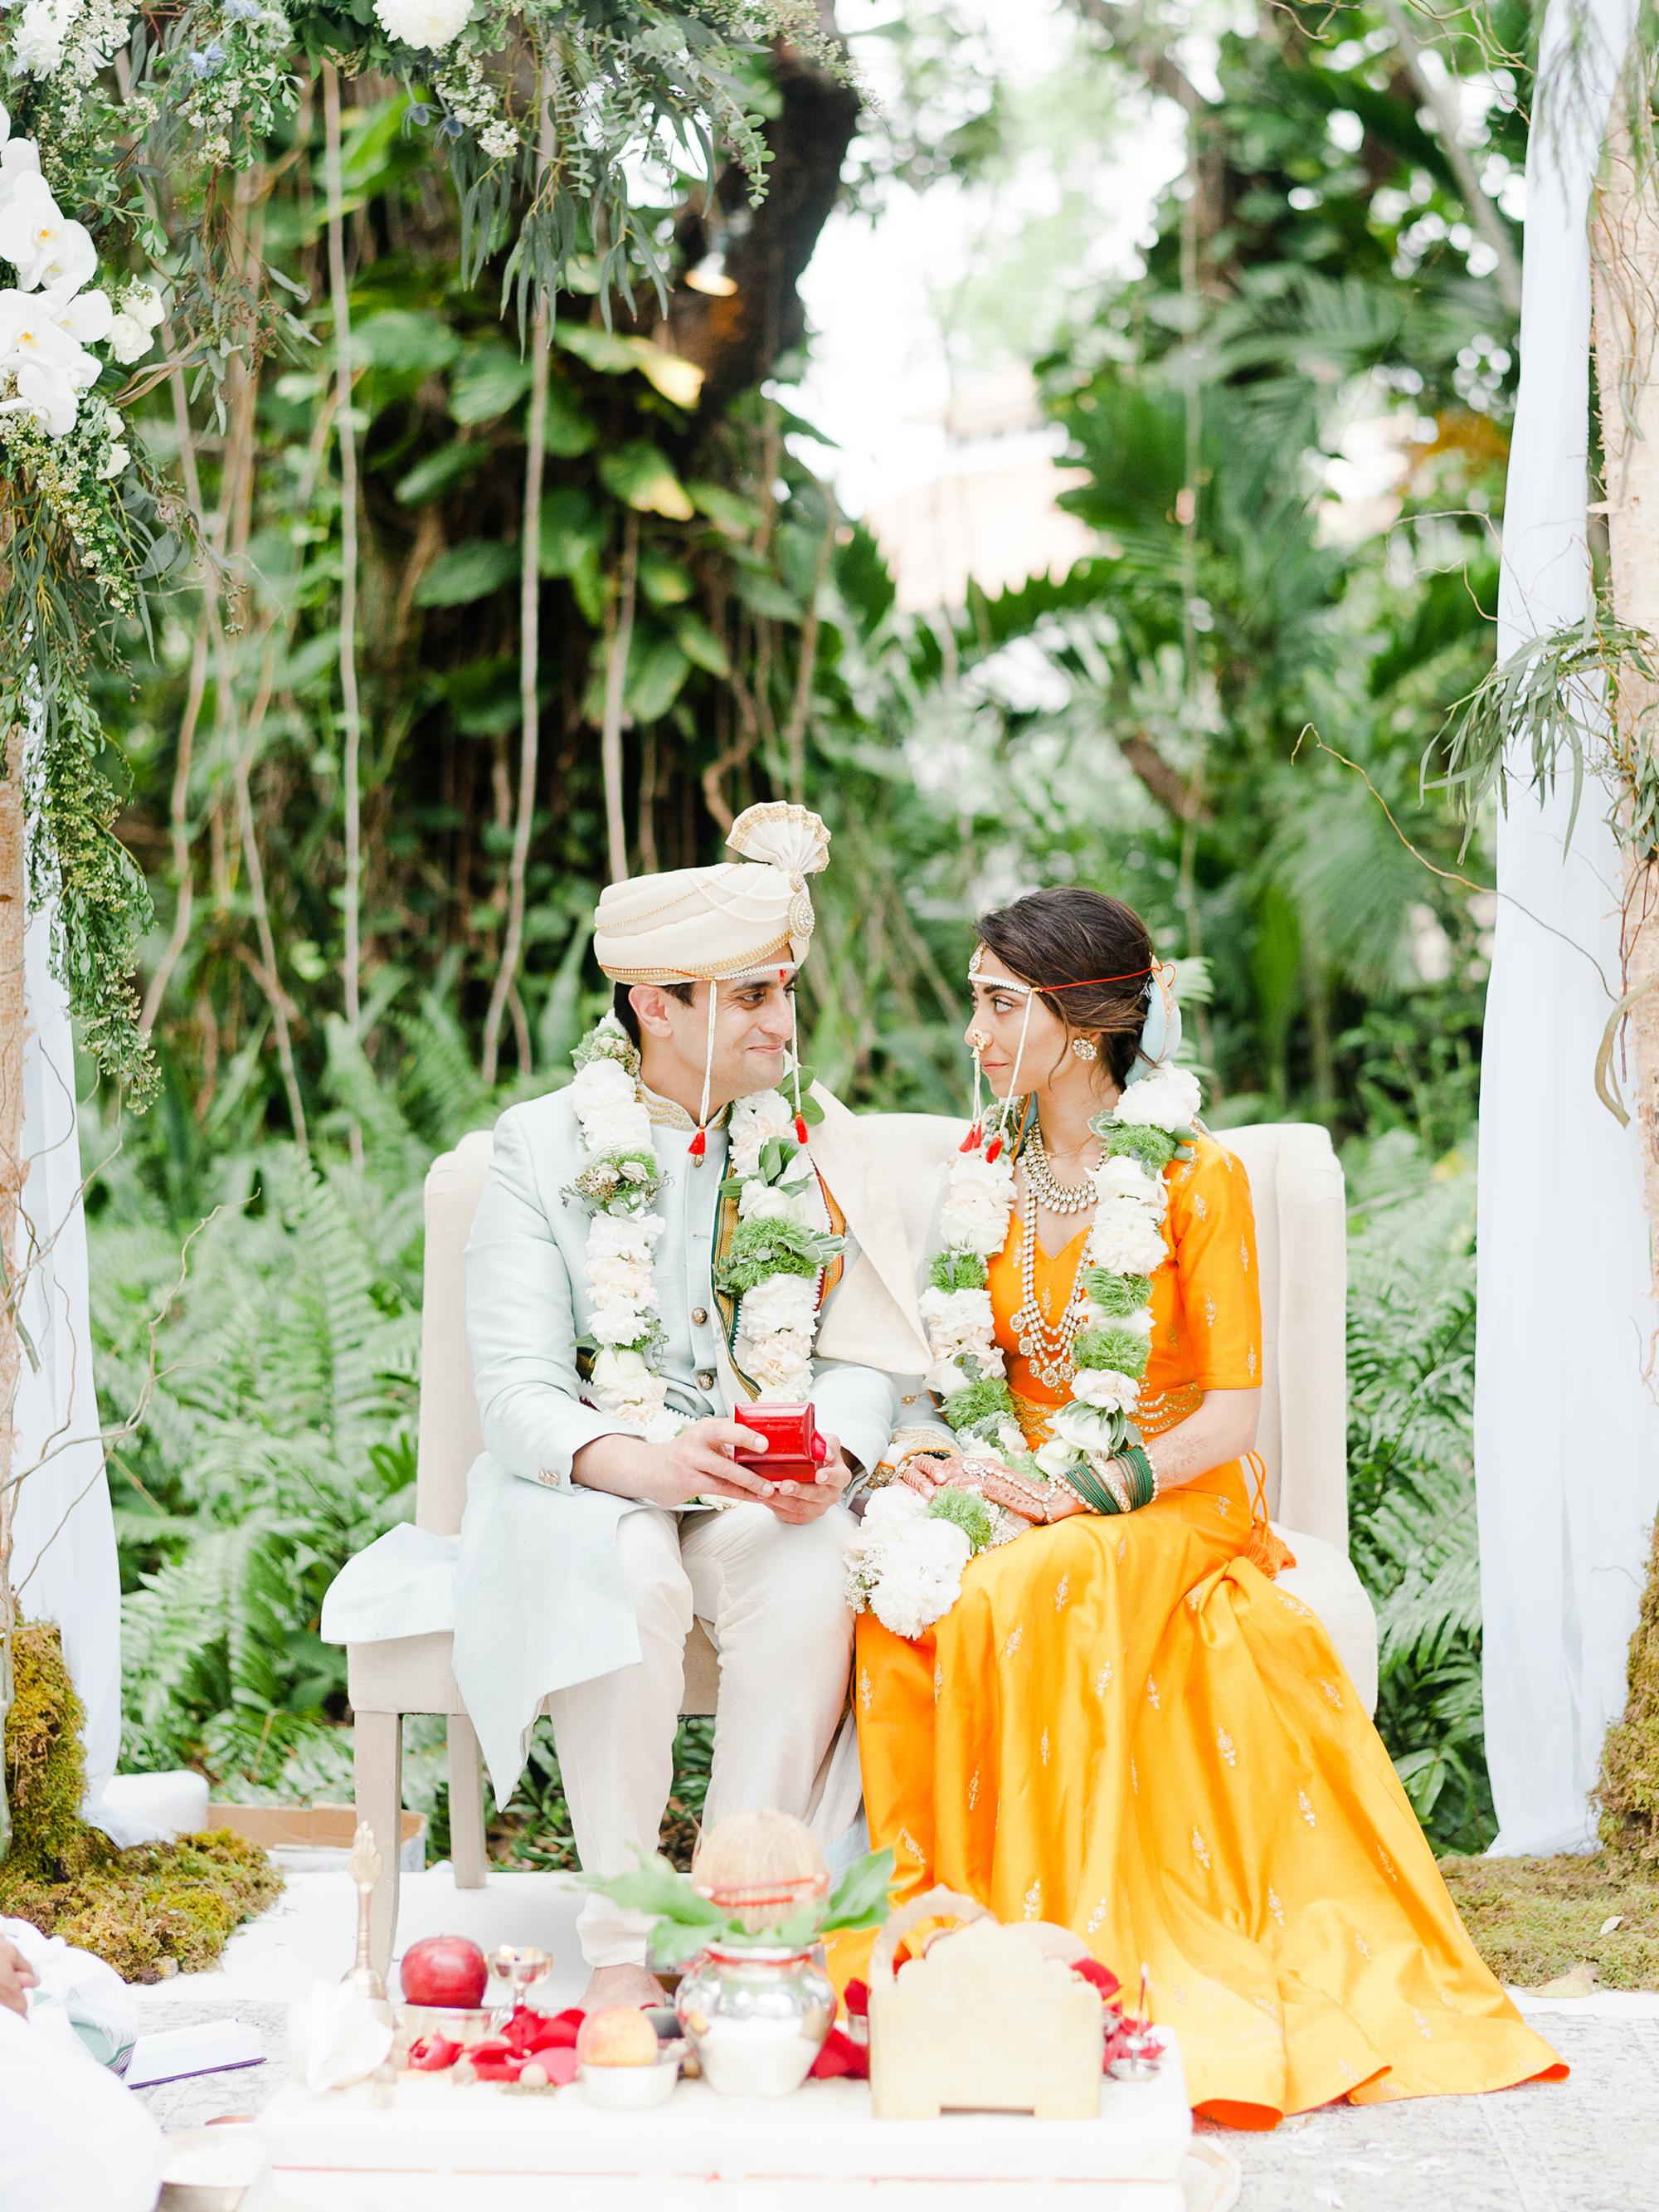 anuja nikhil wedding ceremony bride and groom sitting